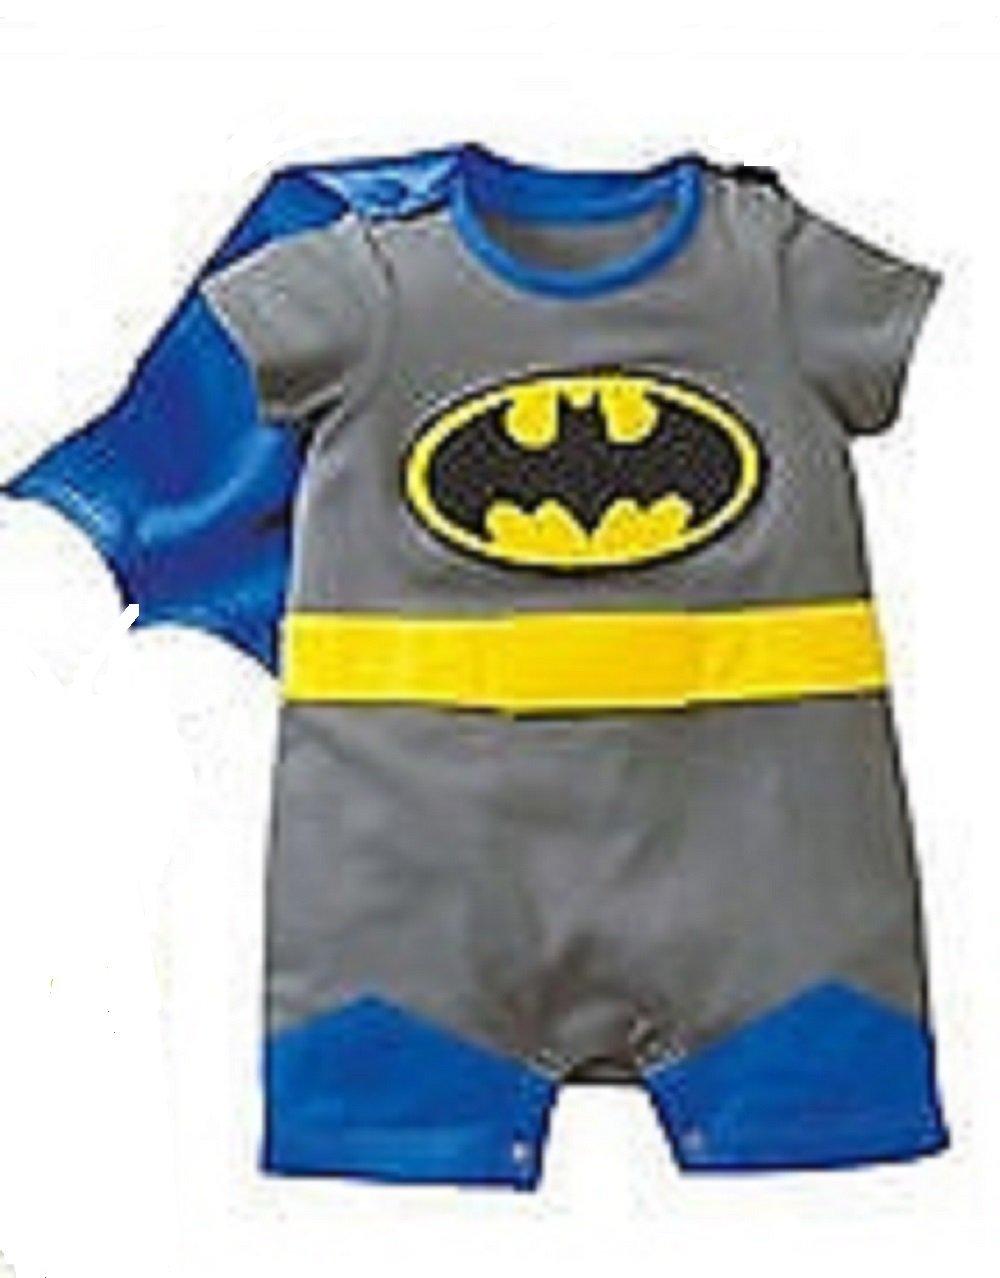 **NEW** CUTE DISNEY BABY ROMPERS BATMAN SUPERMAN 4 SIZES 0-24mths